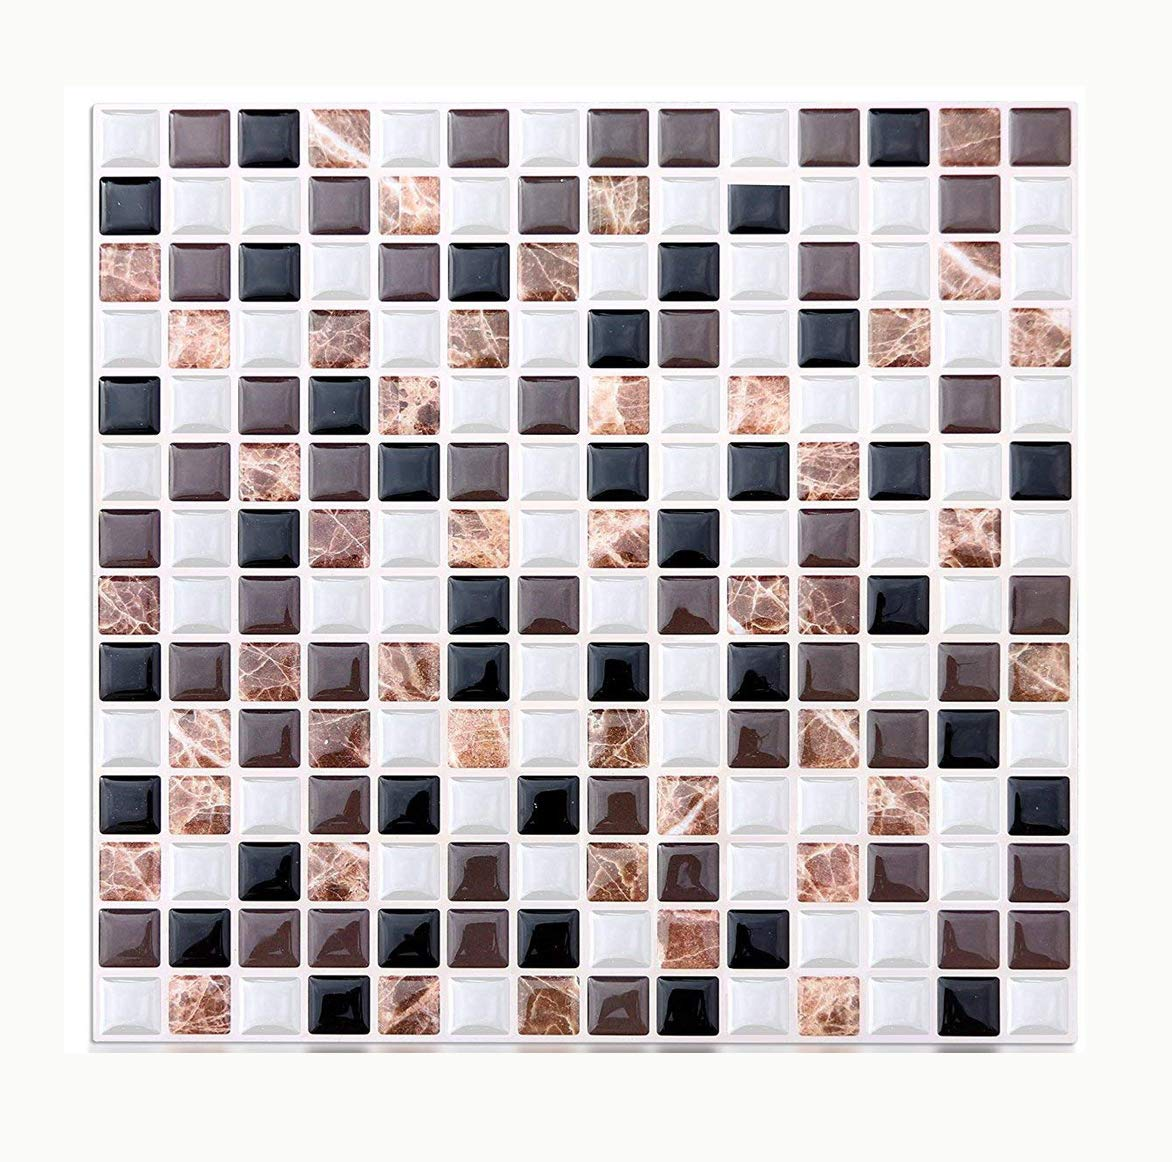 Vamos Tile Premium Anti Mold Peel and Stick Tile Backsplash, Self Adhesive Wall Tiles for Kitchen & Bathroom-10 x 9 (6 Sheets)